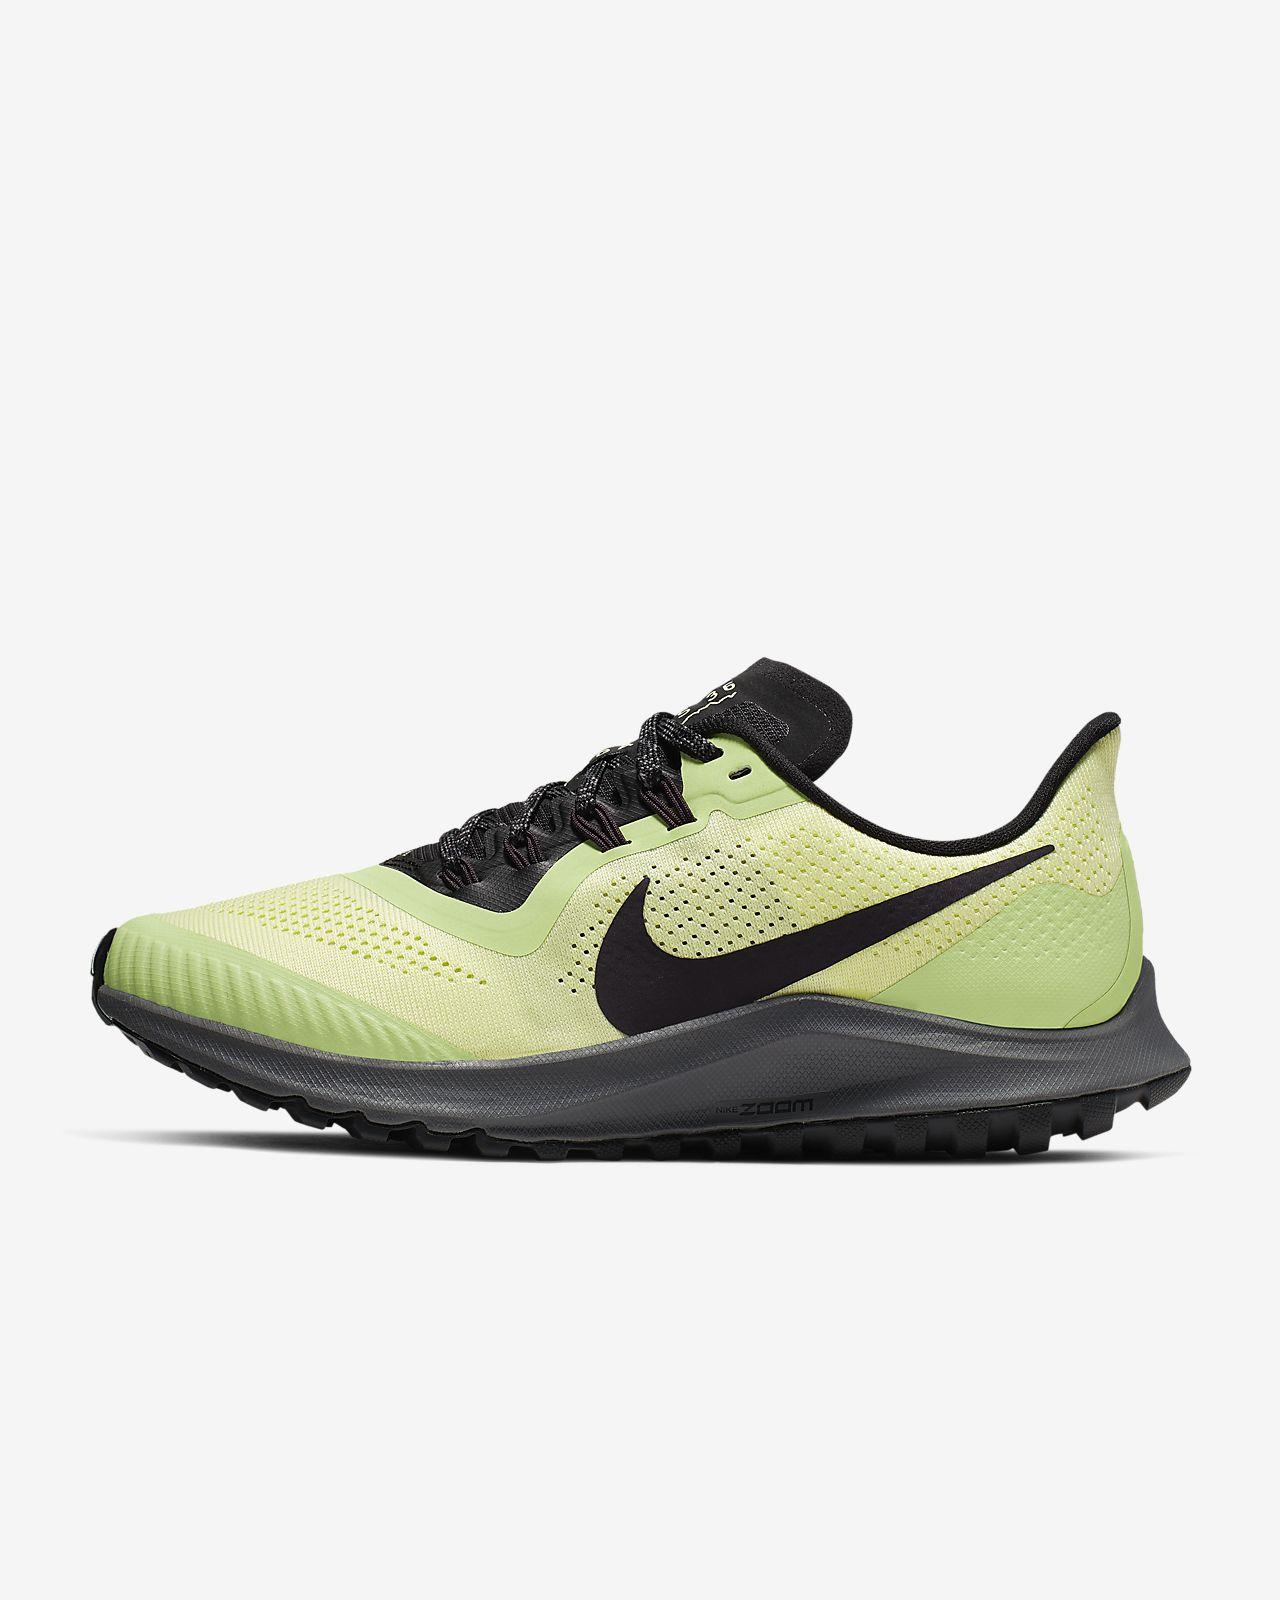 Zoom Pegasus Trail De Pour Femme Chaussure Nike Running 36 Air ZkXuiP